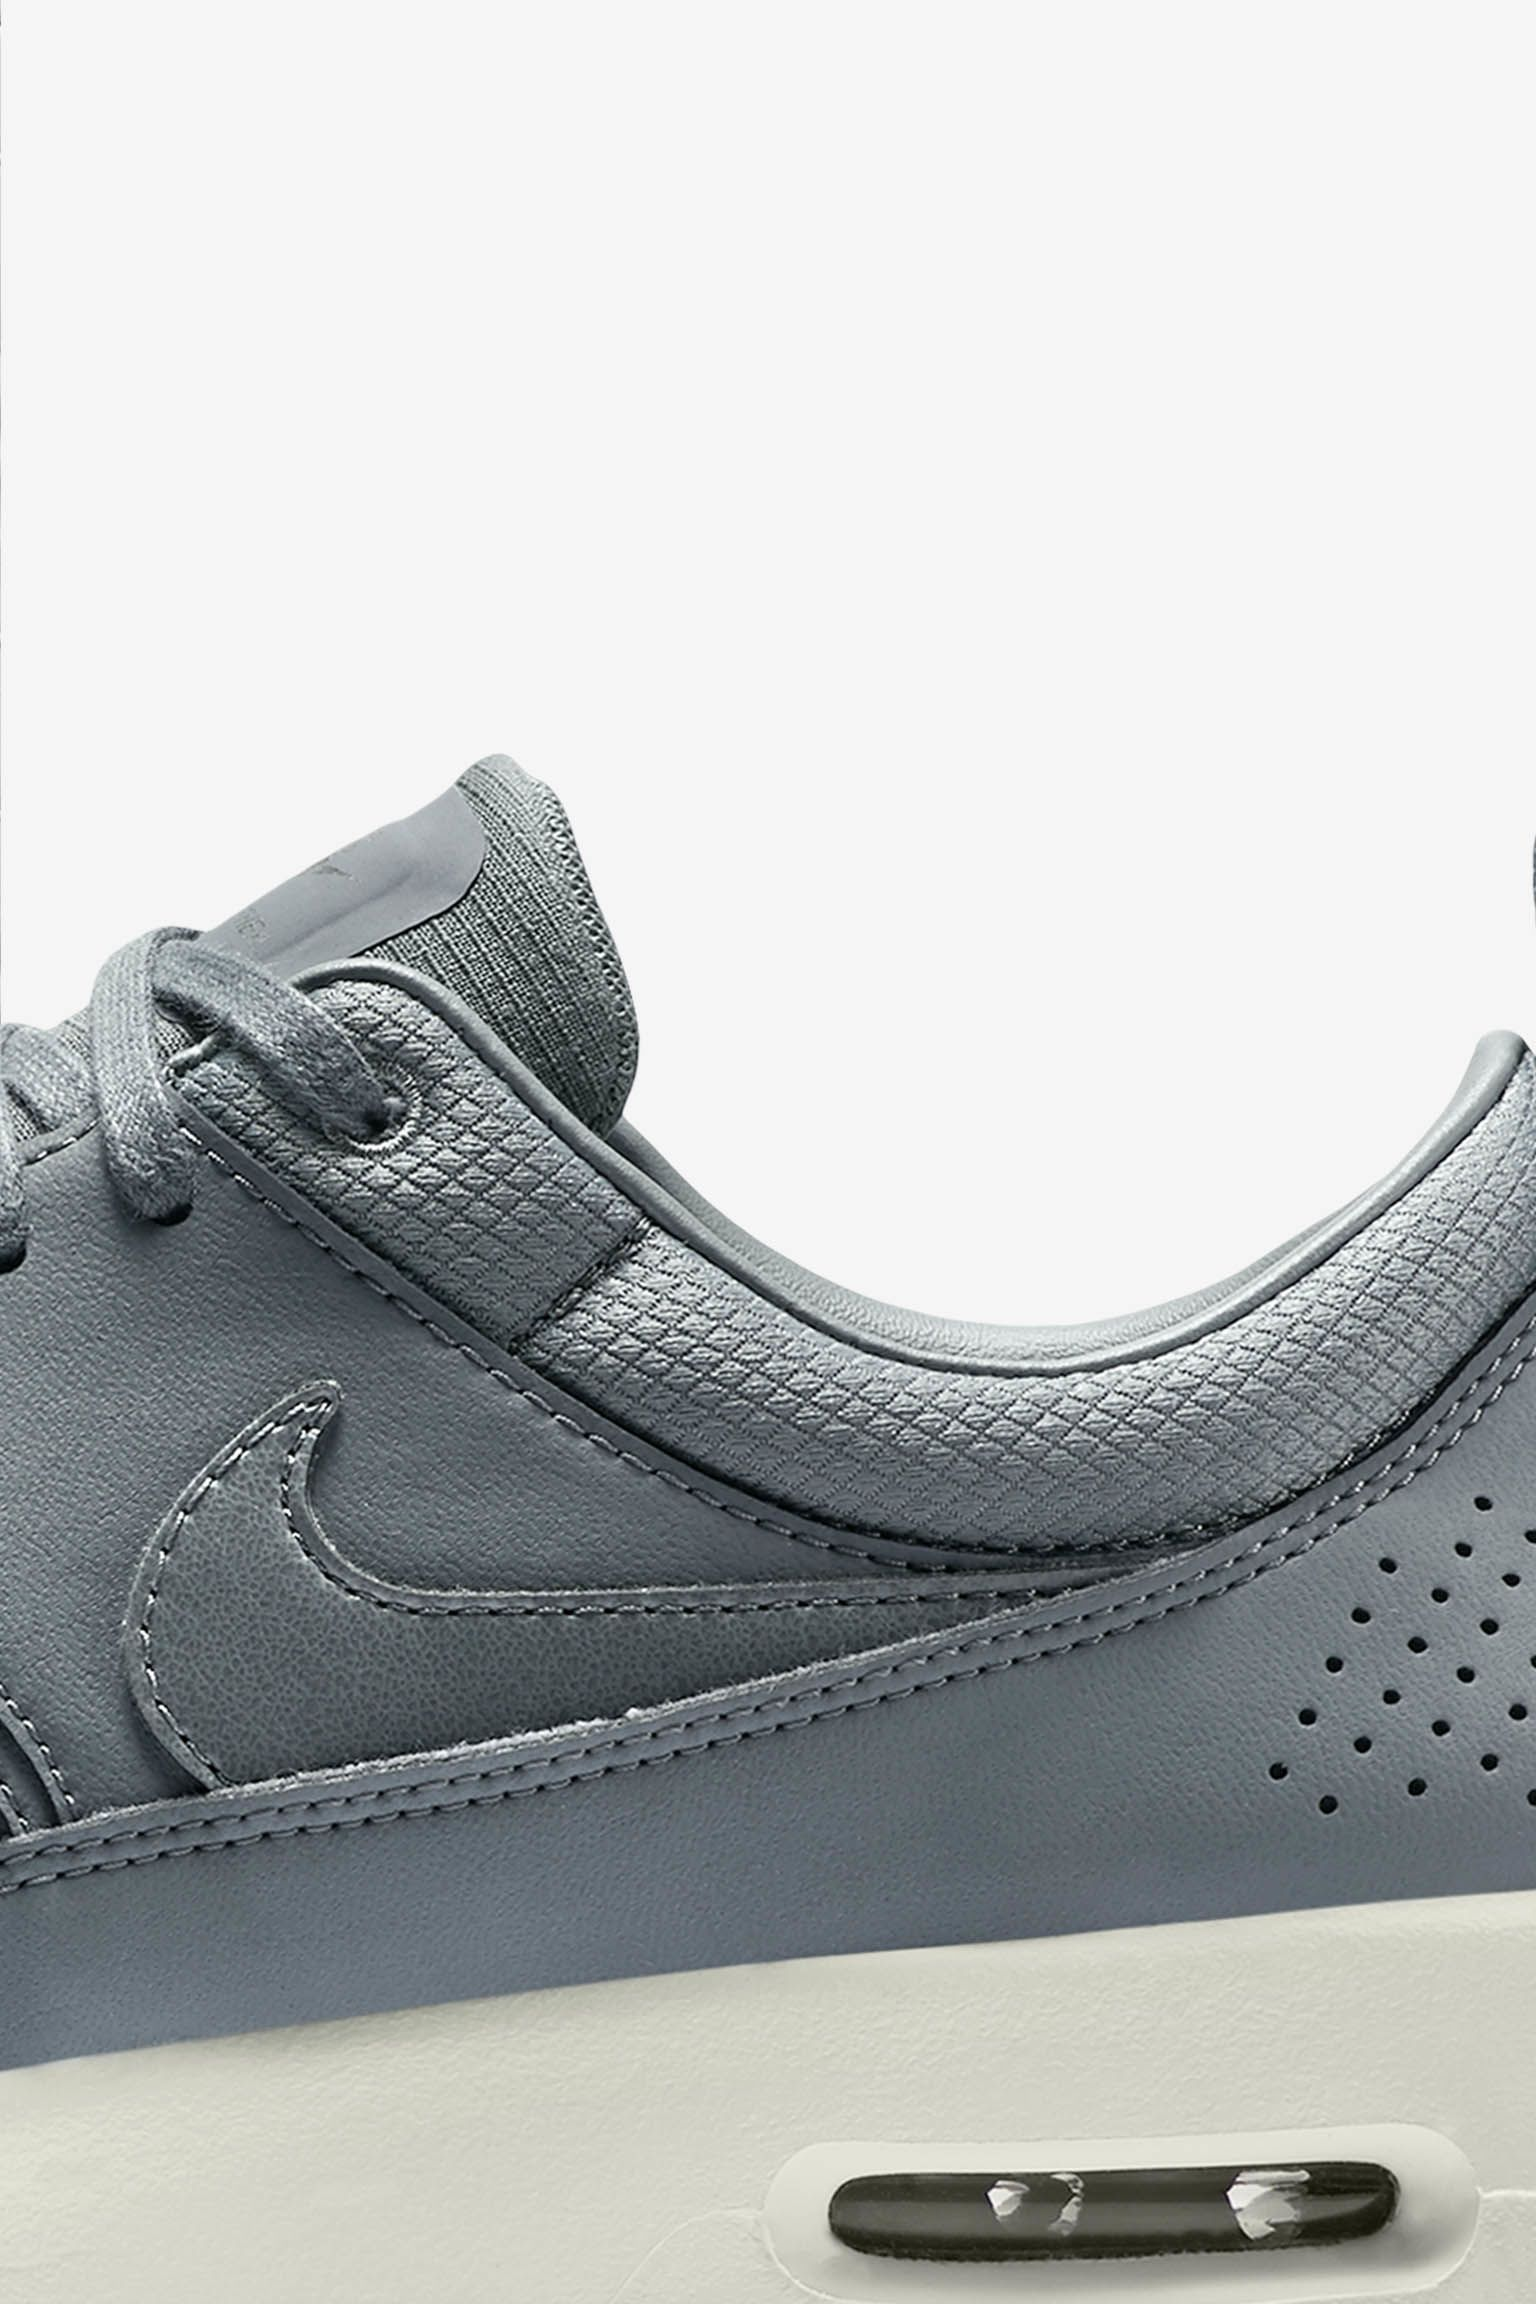 Women's Nike Air Max Thea Premium 'Cool Grey & Metallic Pewter'